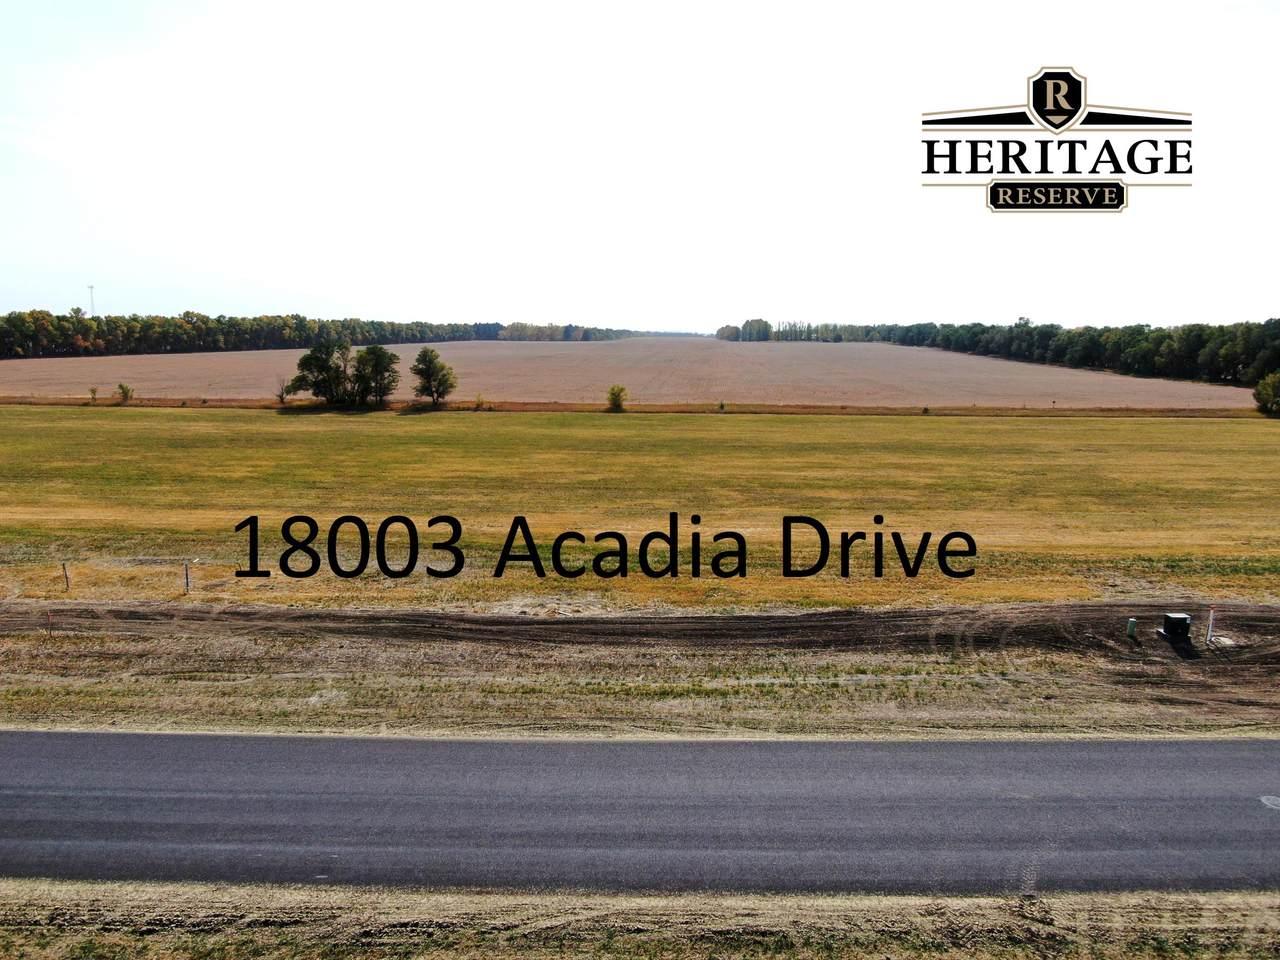 18003 Acadia Drive - Photo 1